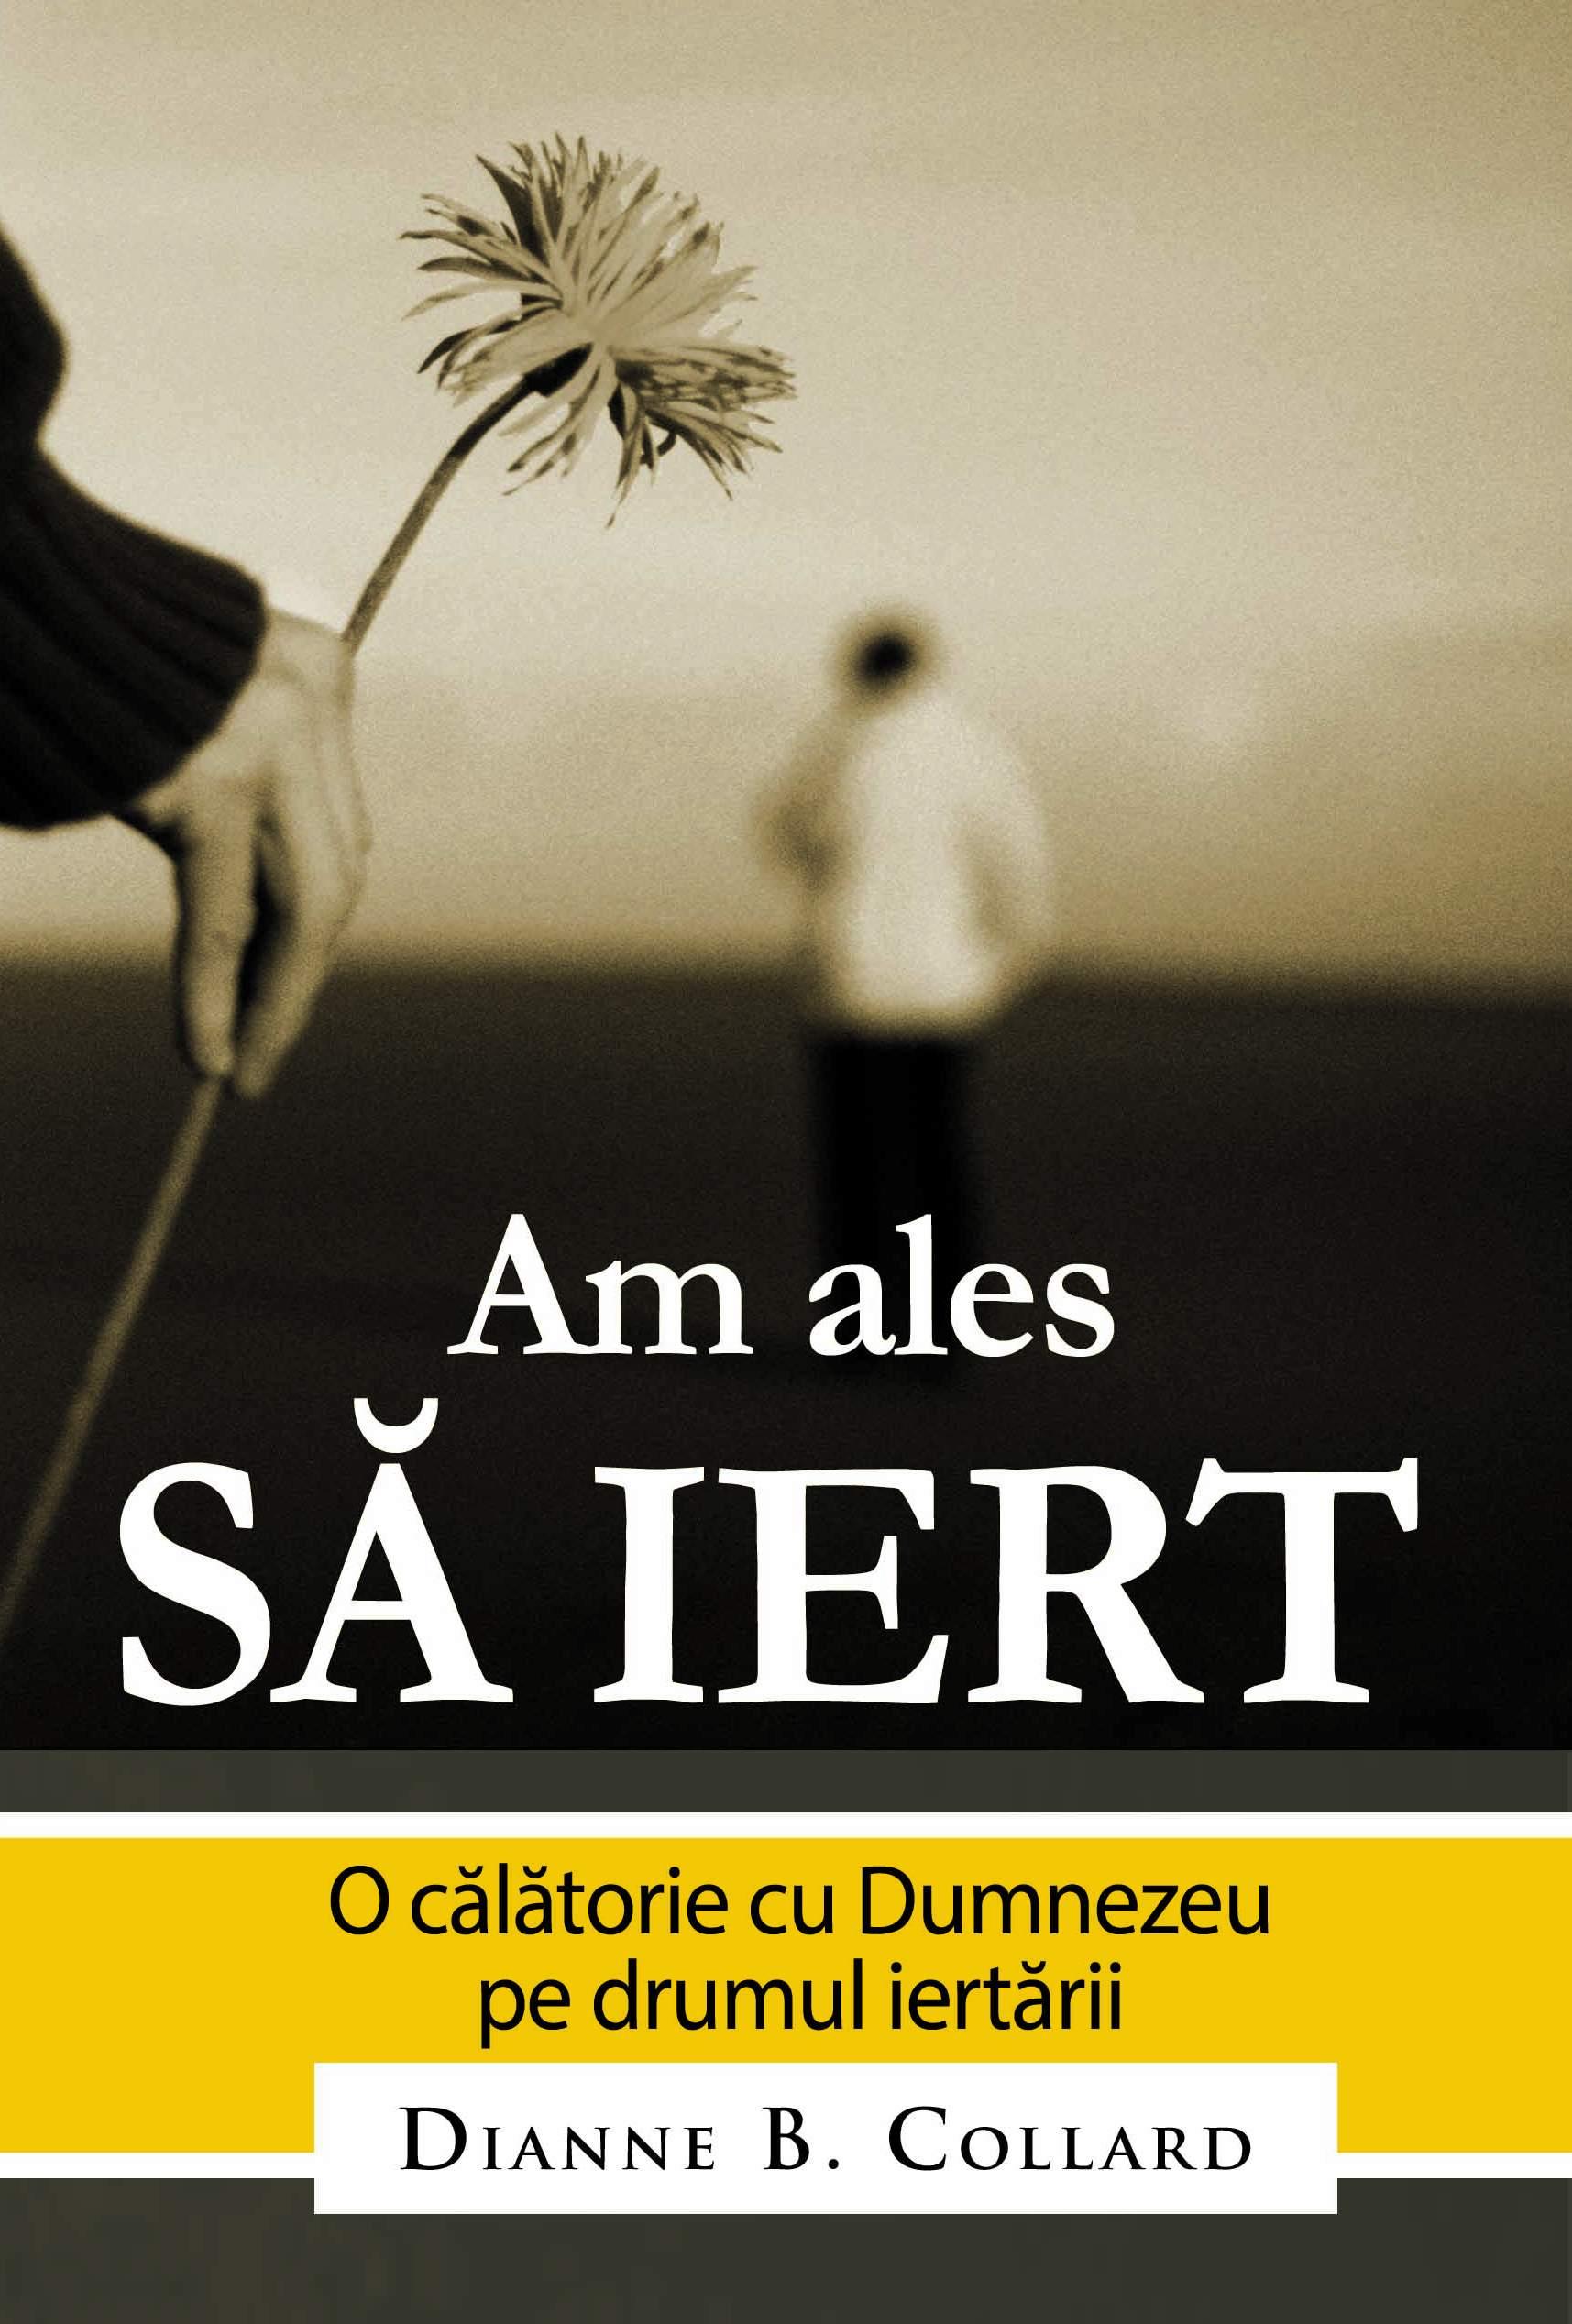 Romanian: Centrul Areopagus